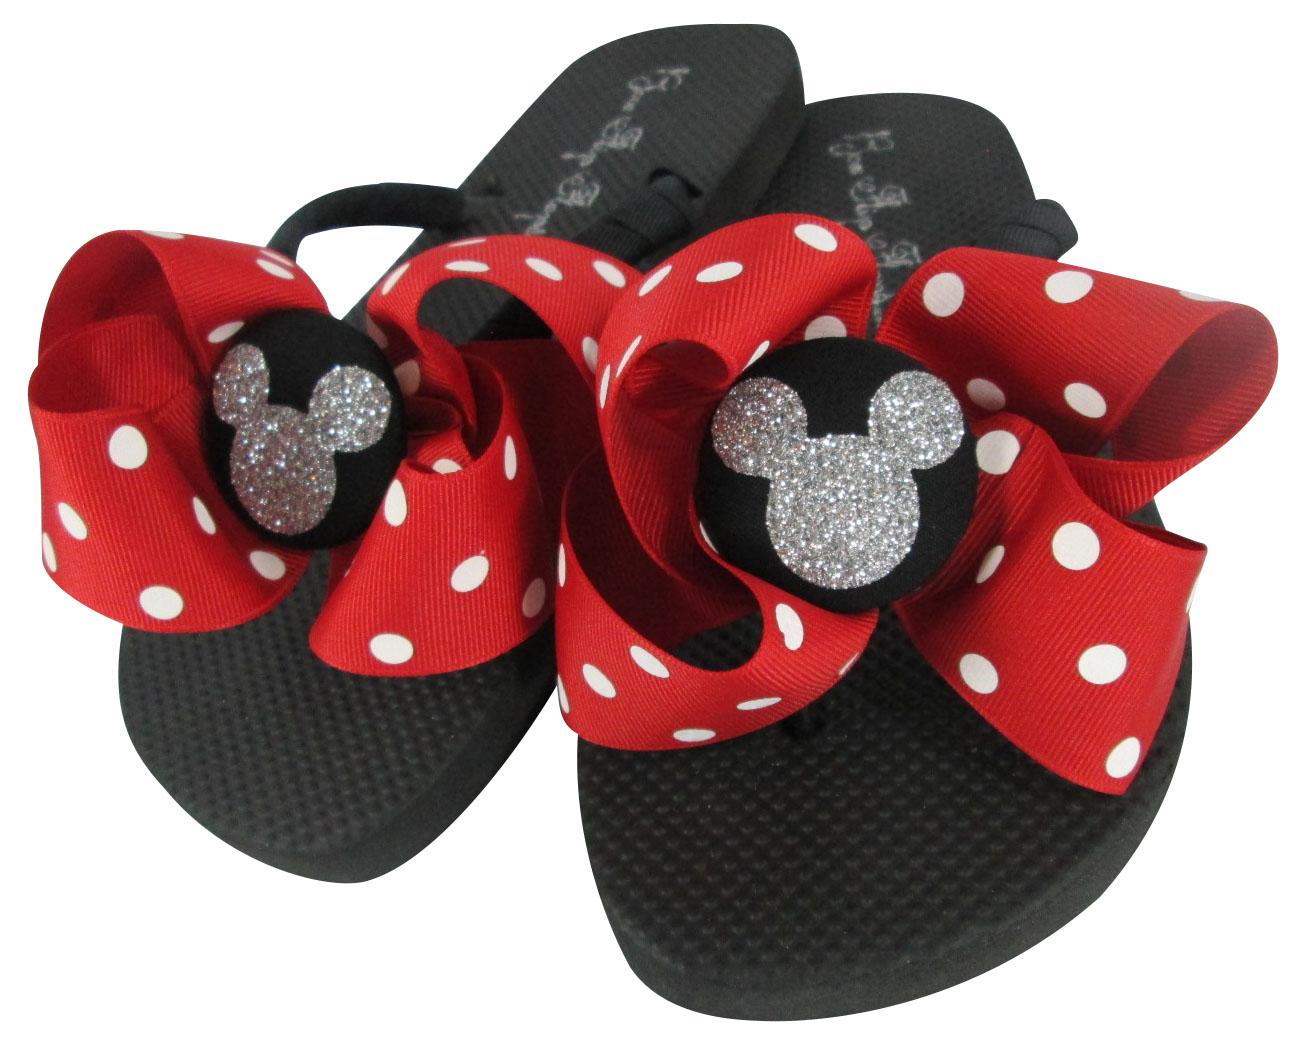 421cfc2513962 Disney Flip Flops